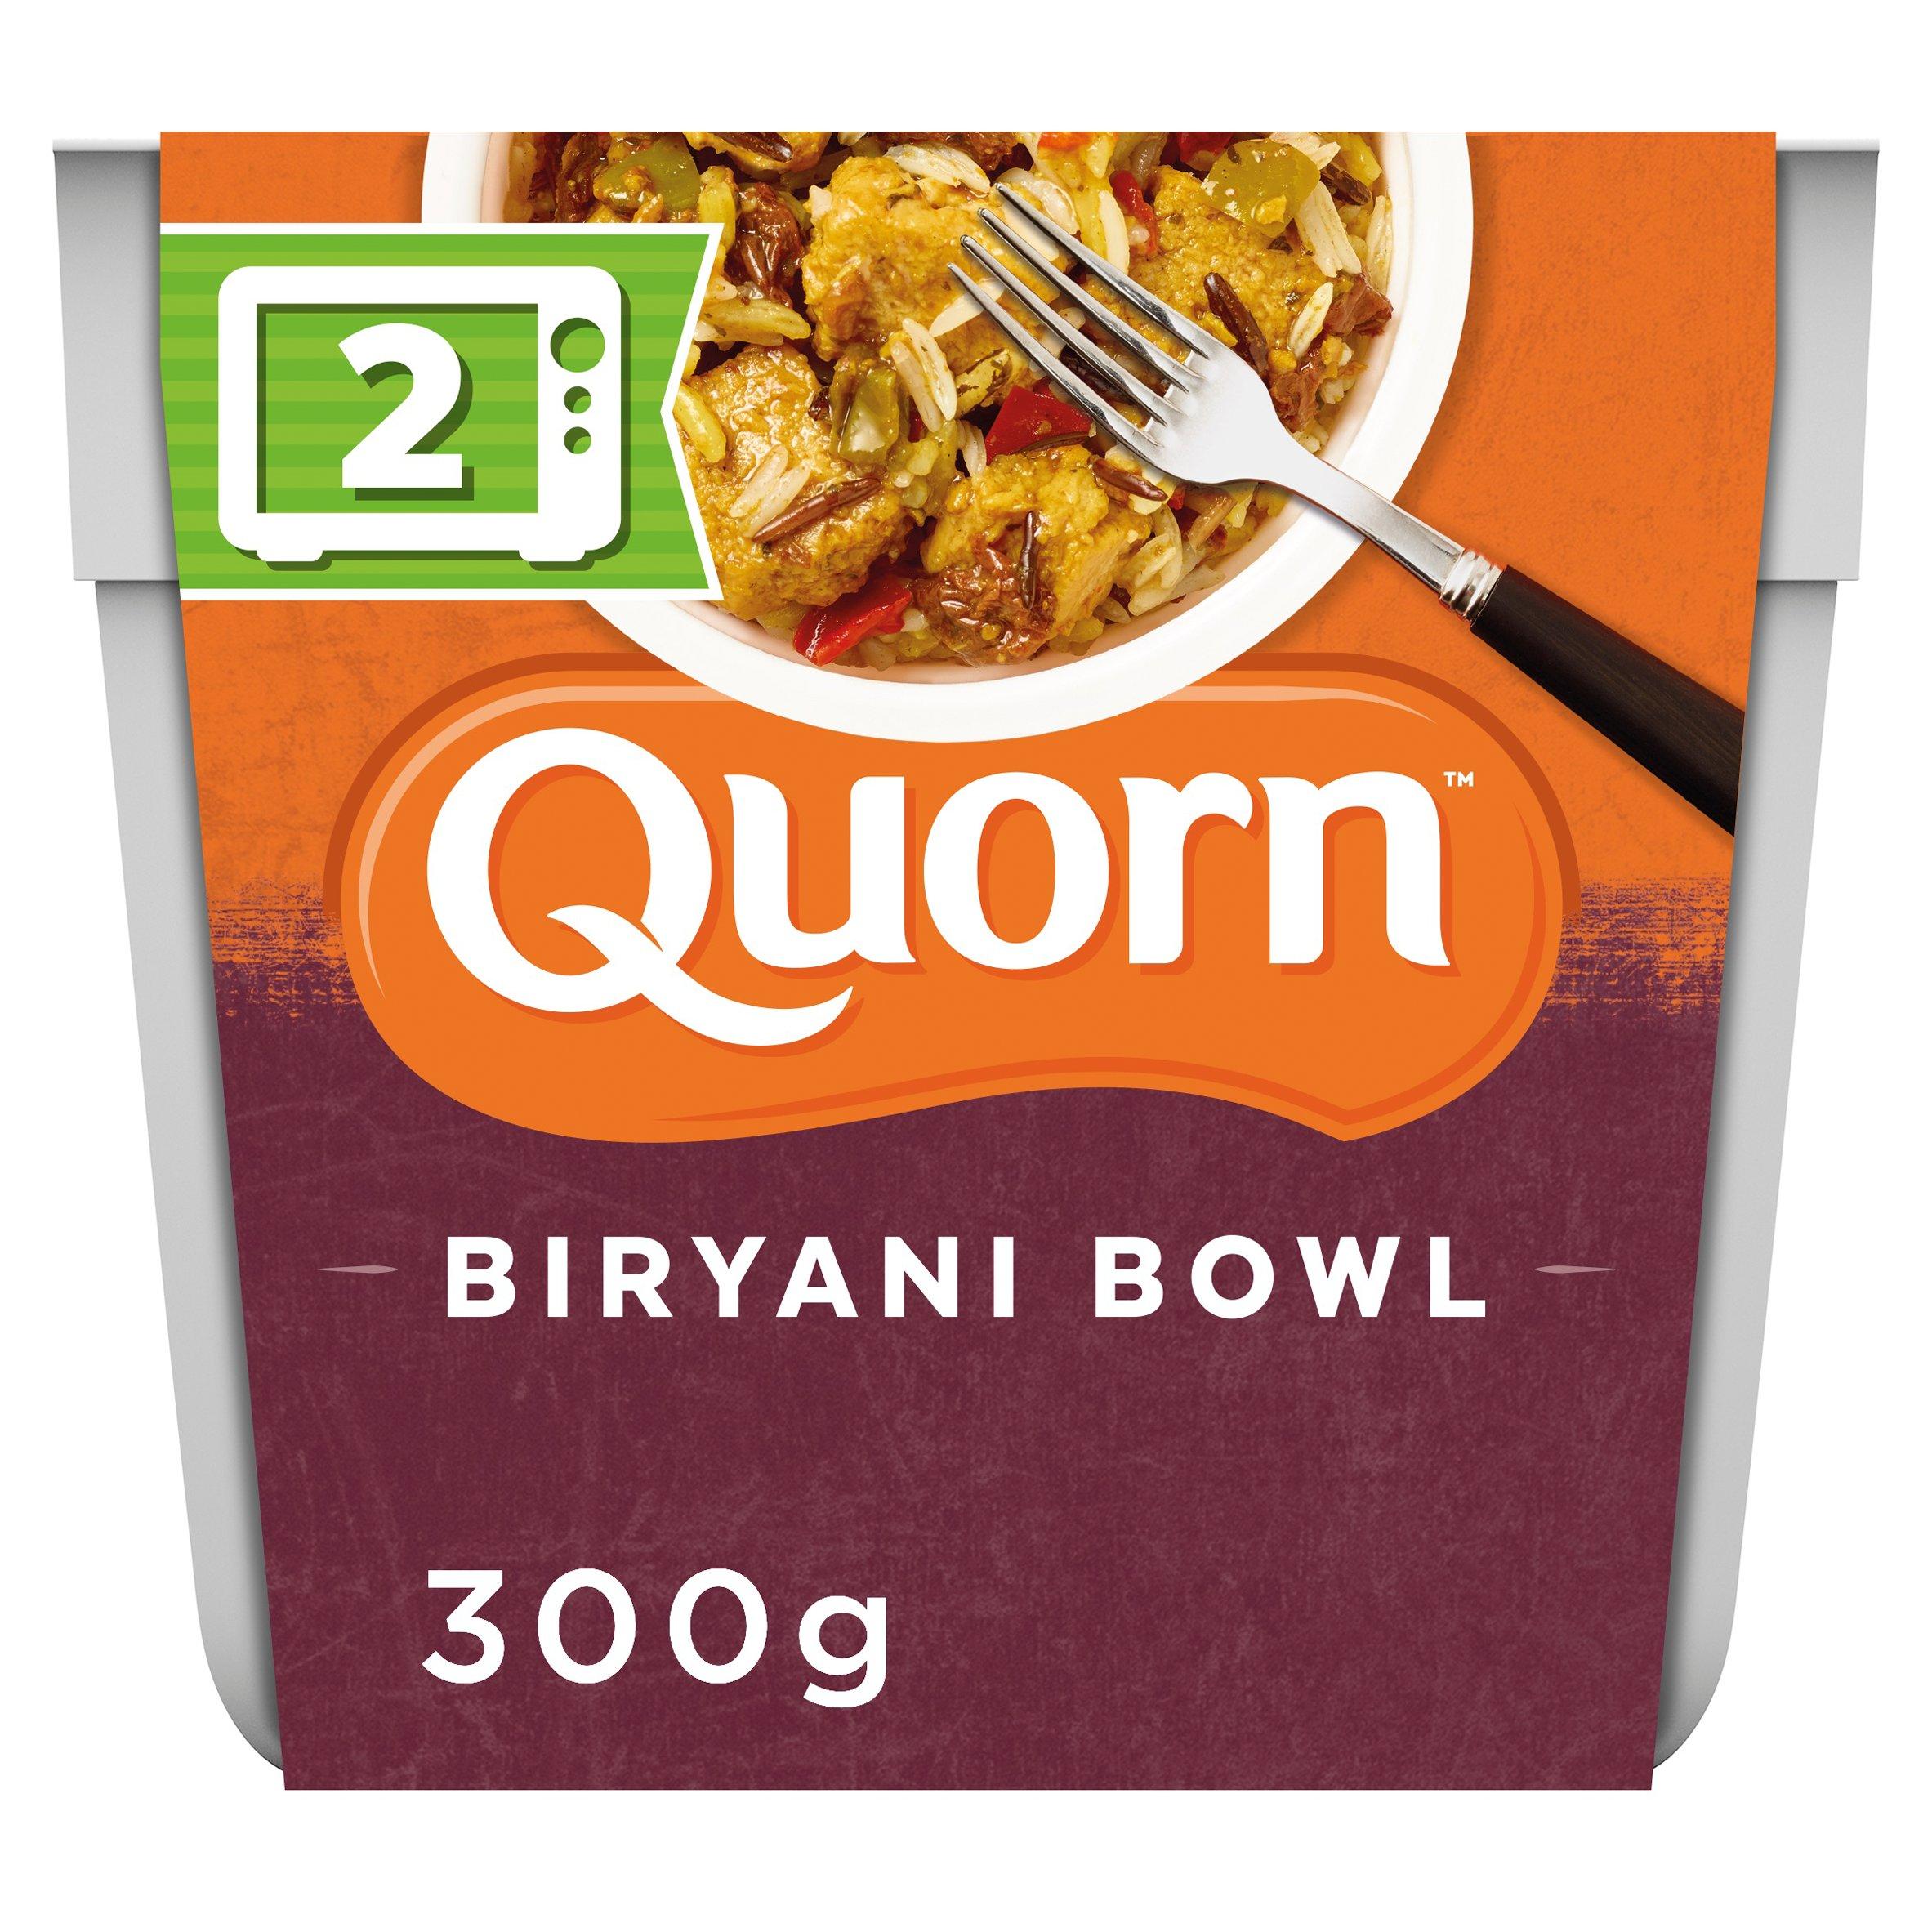 Quorn Biryani Bowl 300G